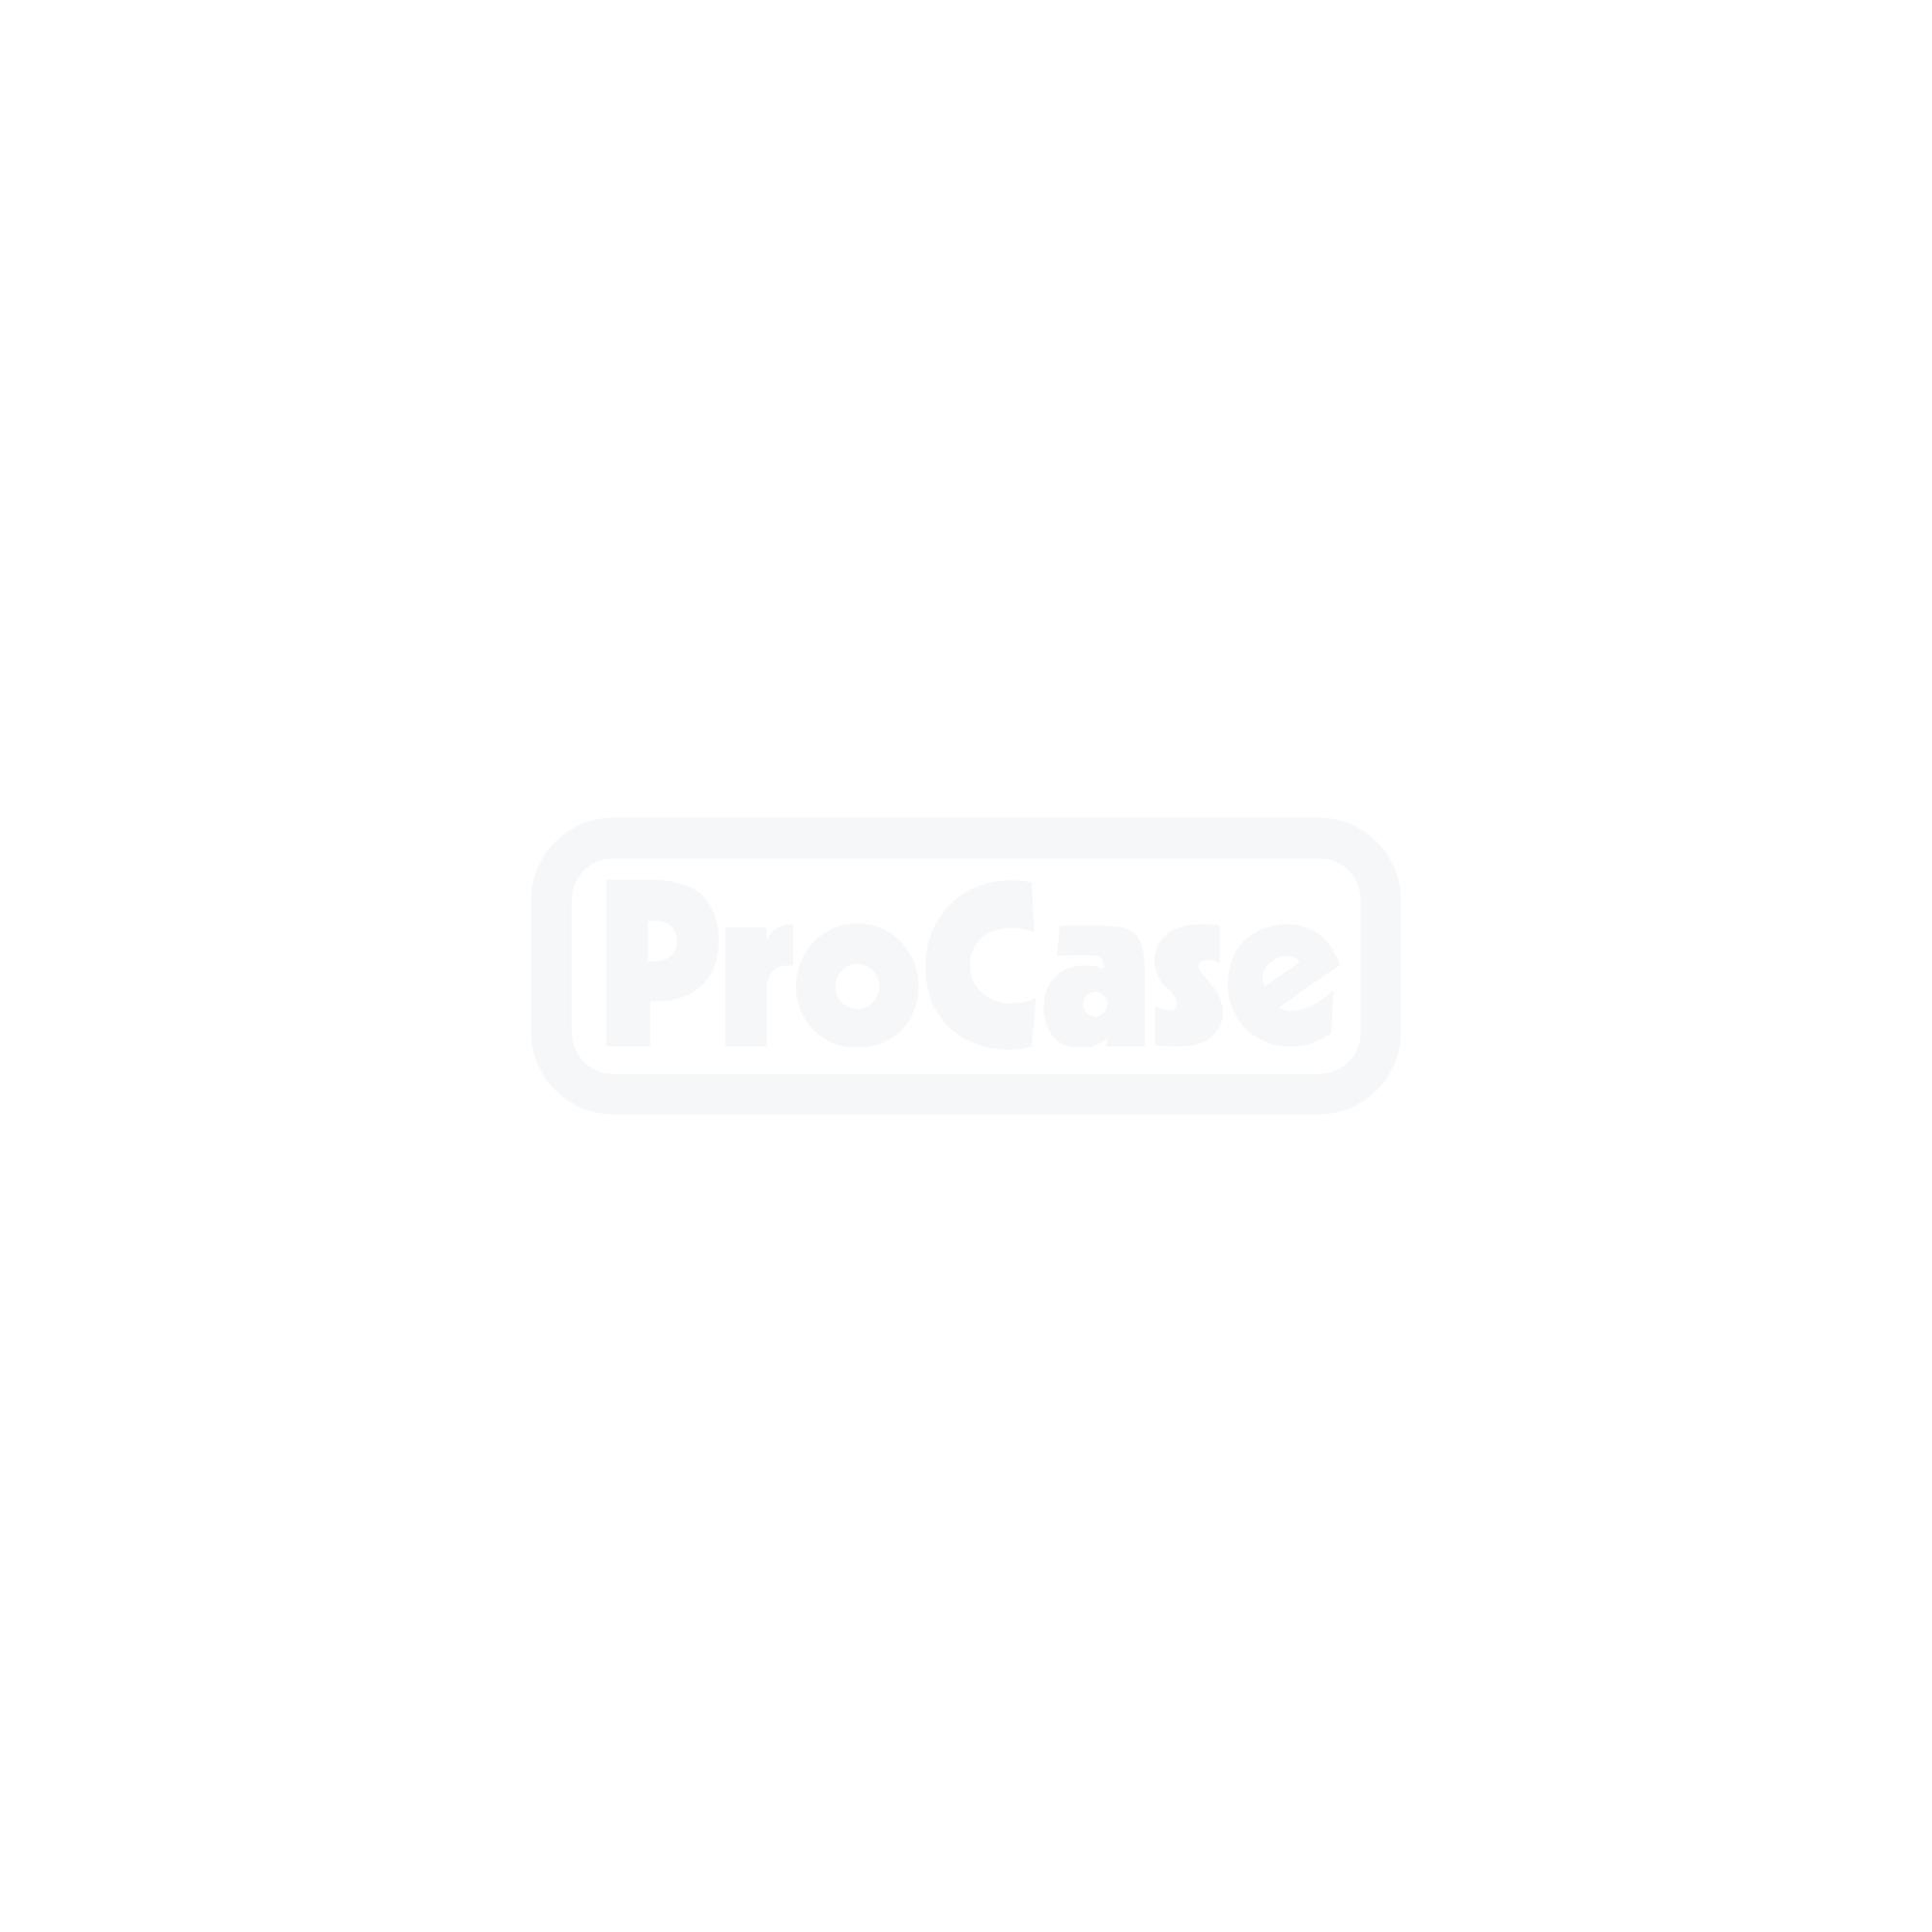 Stativ-Case / Hardware-Case 140